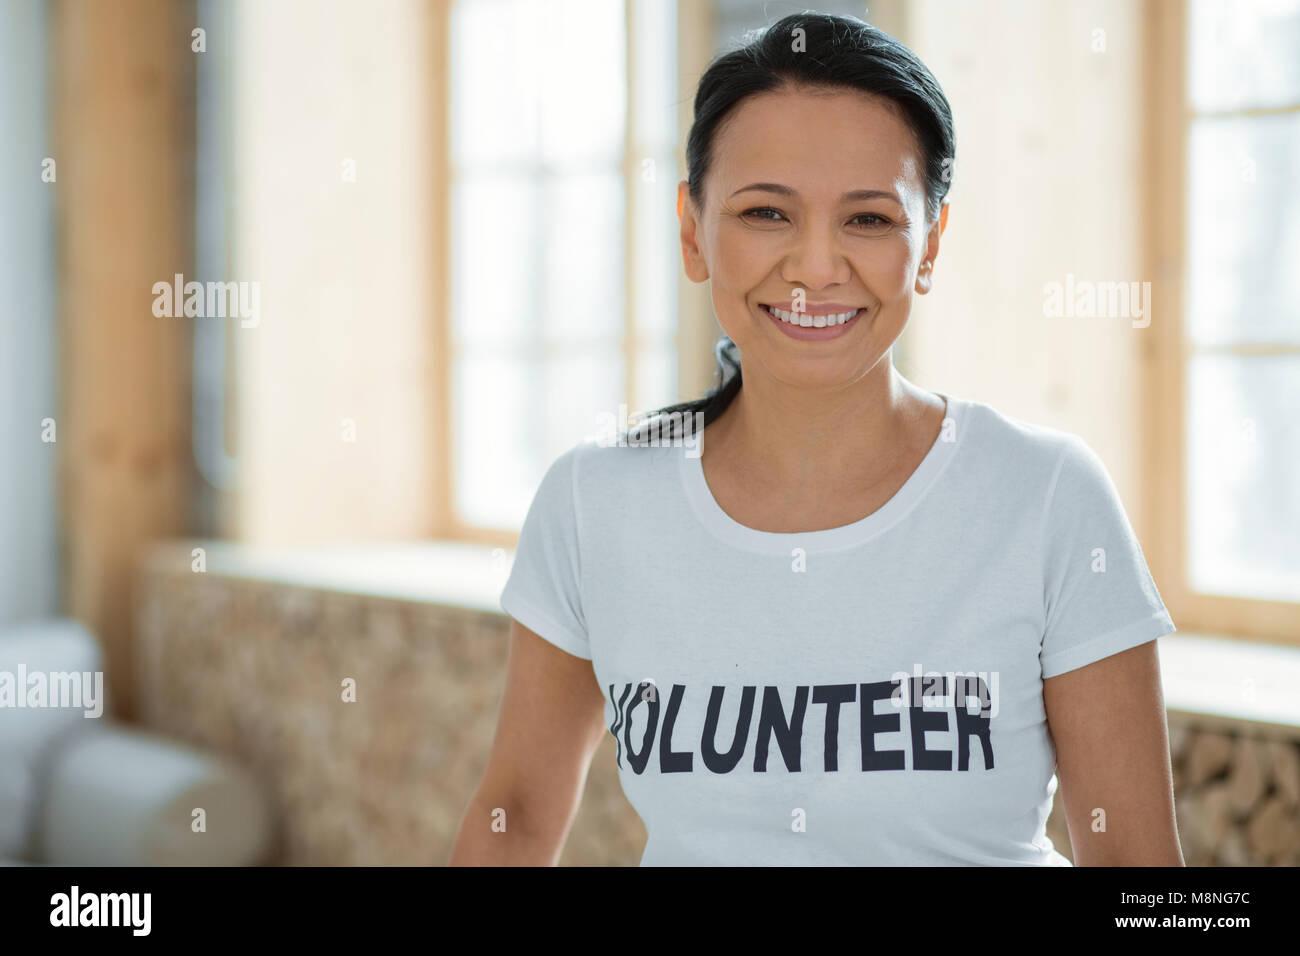 Cheerful female volunteer performing community service - Stock Image